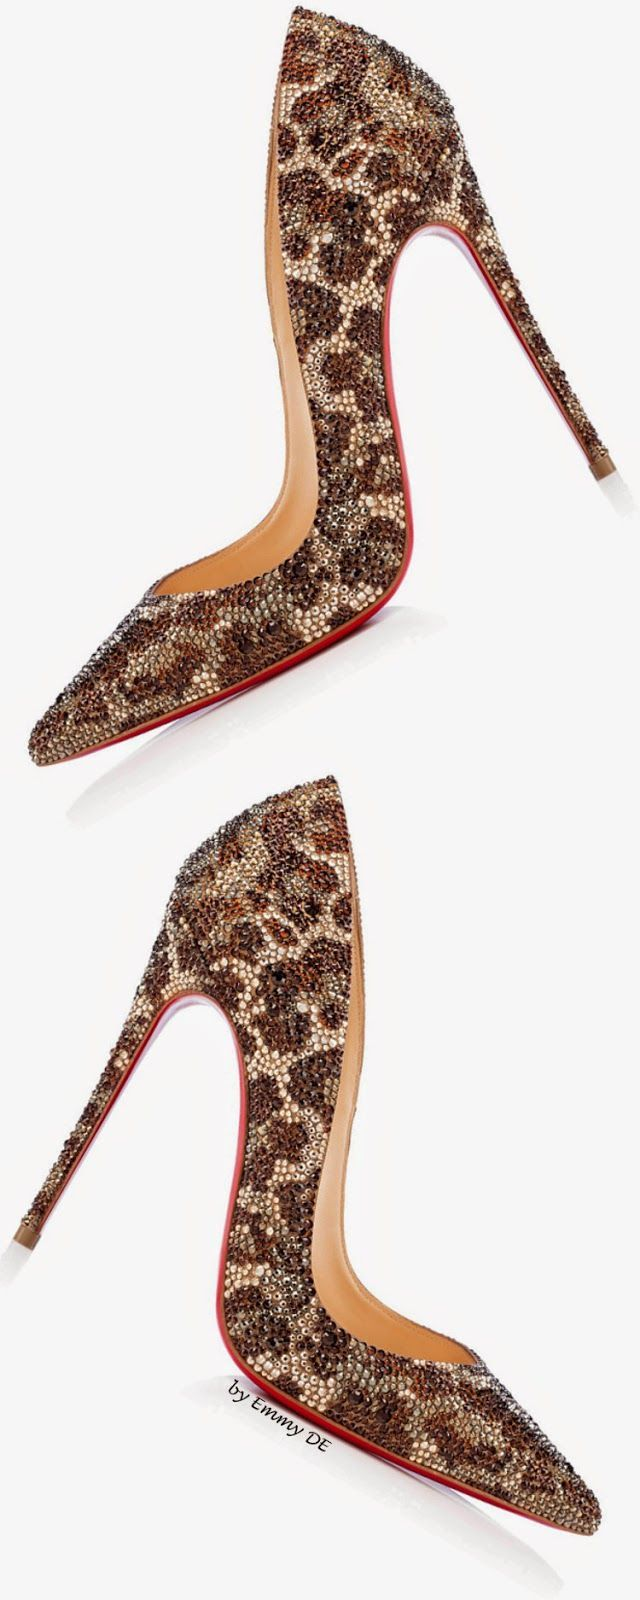 Christian Louboutin luxur swarovski crystal leopard pattern shoes. <3 @benitathediva